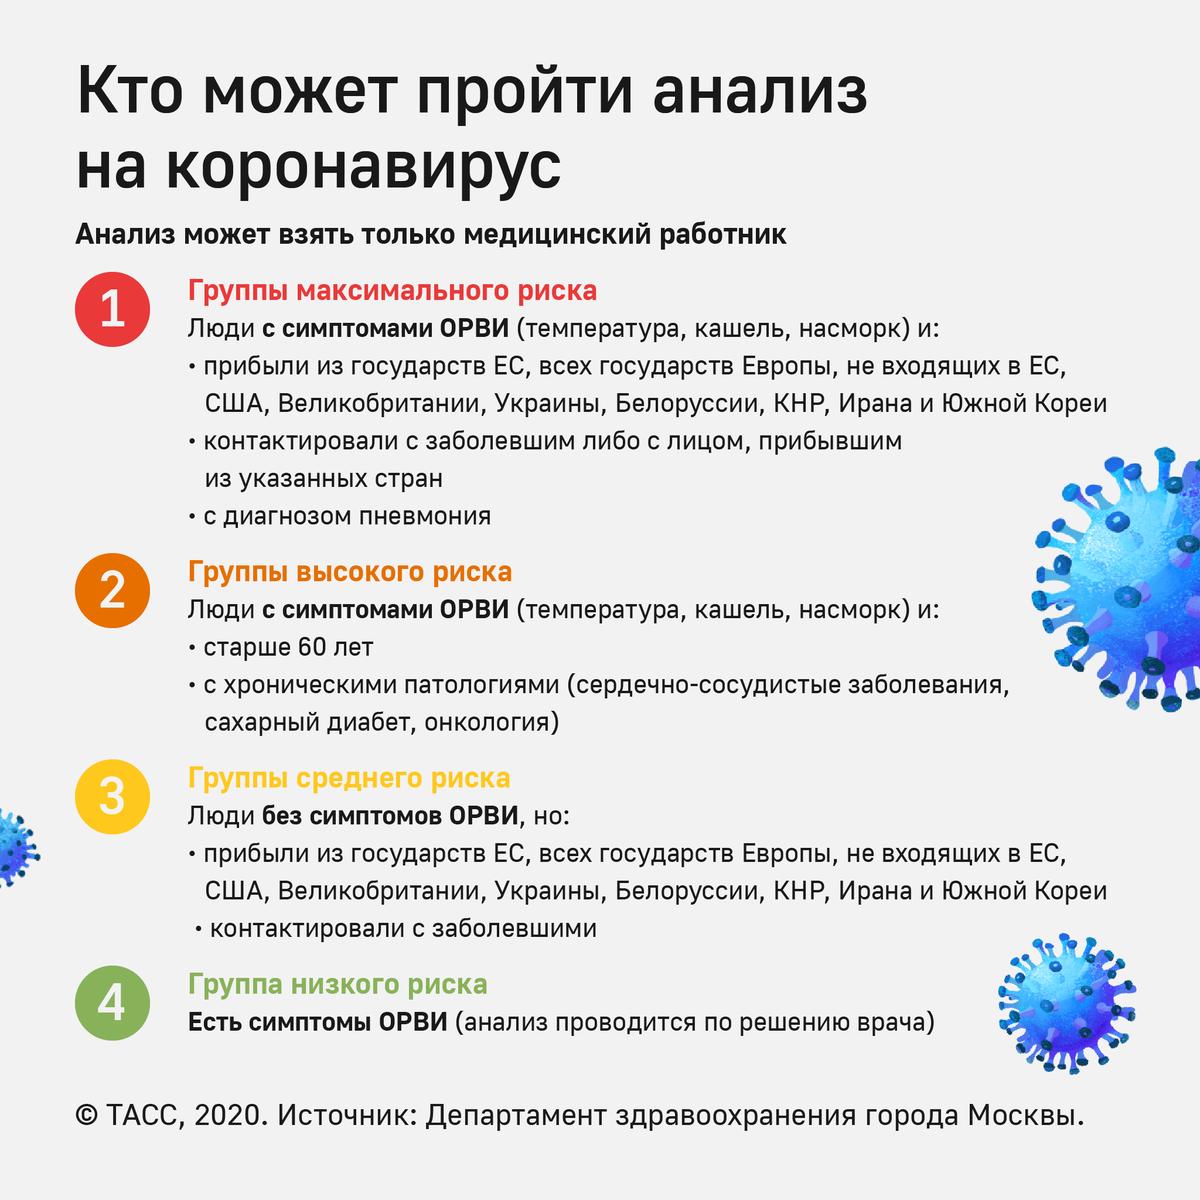 Что такое самоизоляция юридически при коронавирусе?